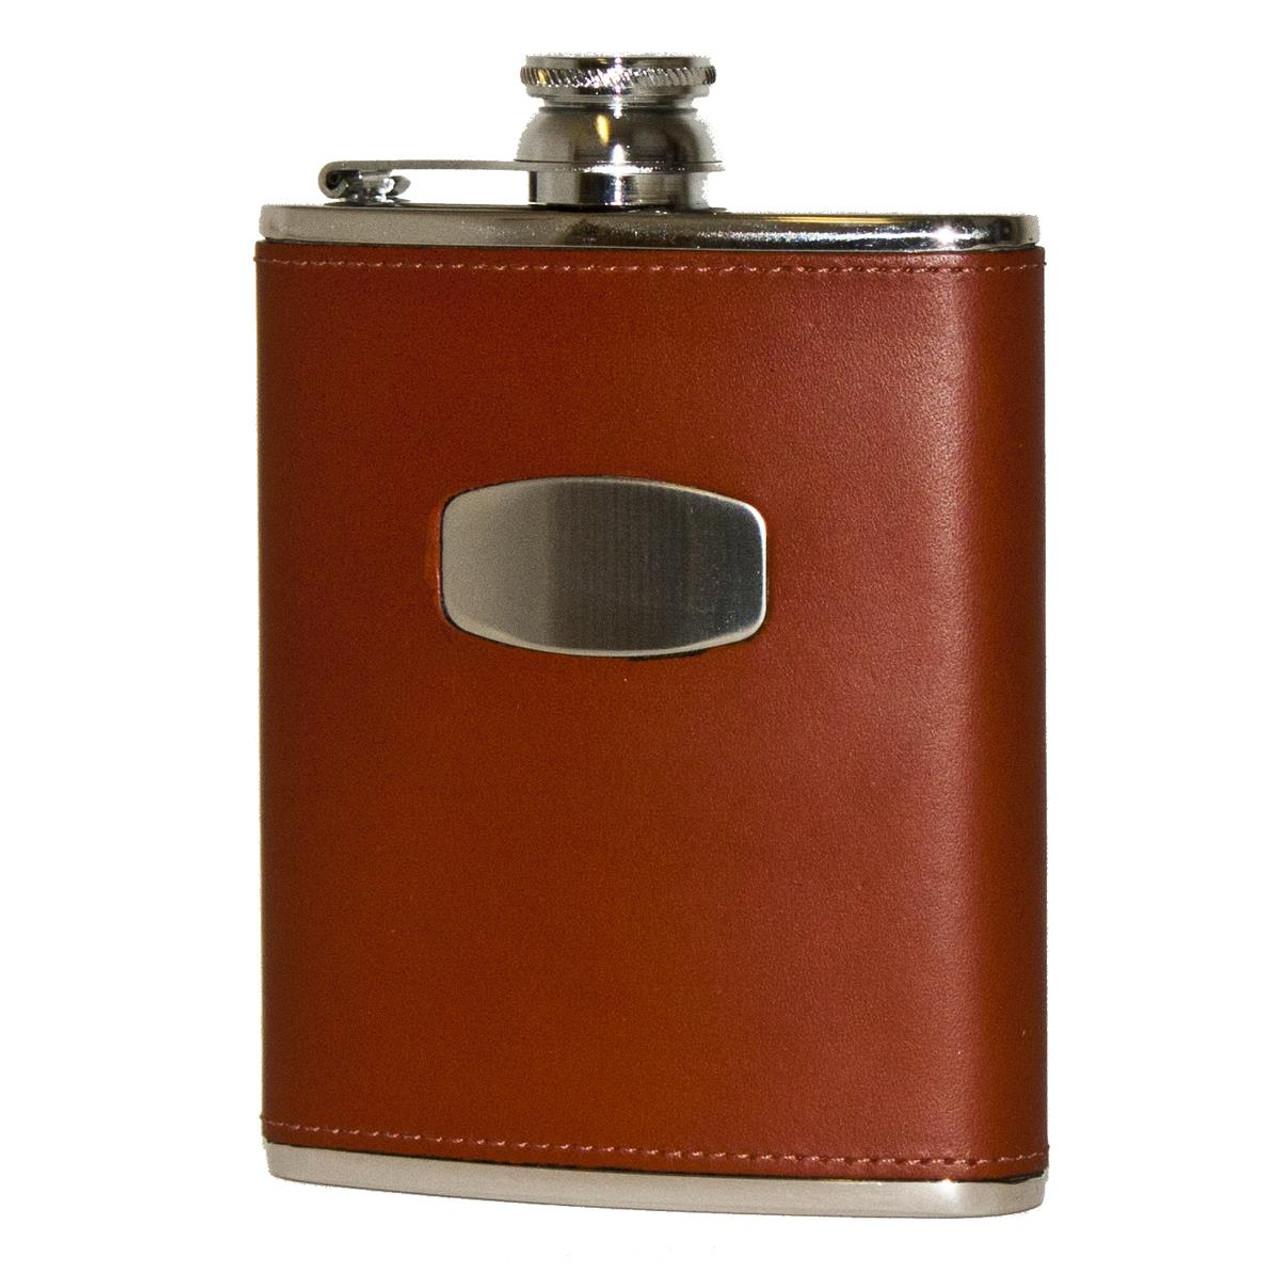 Brown Leather Bisley Hip Flask